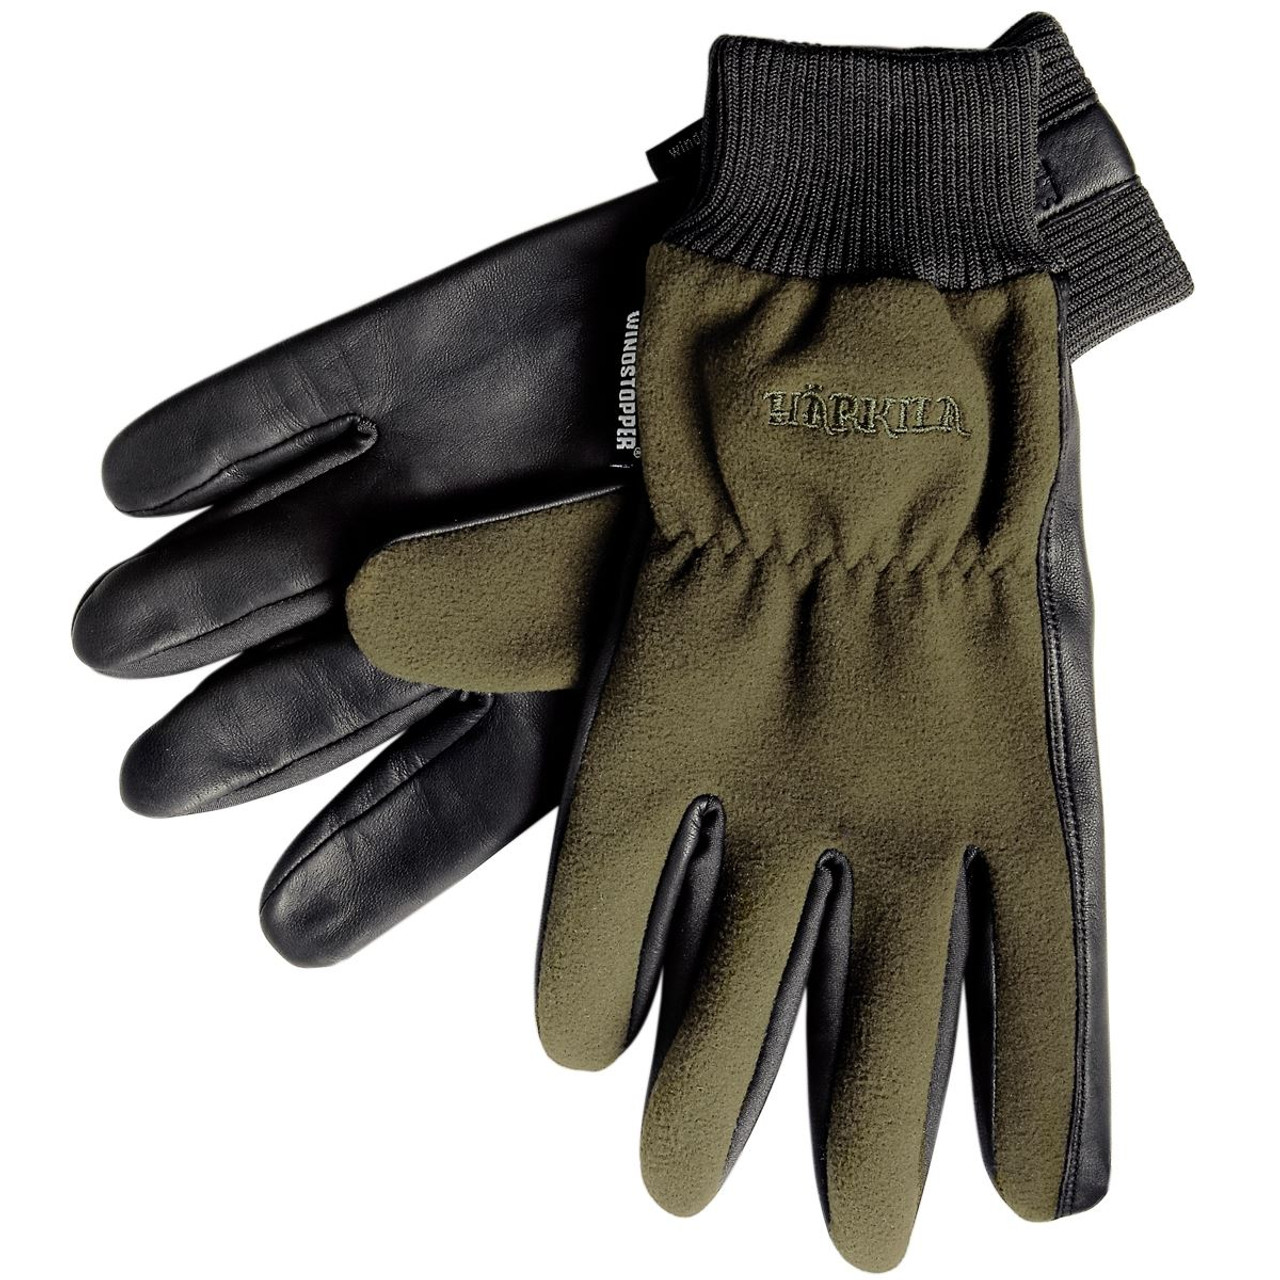 Harkila Pro Shooter Gloves